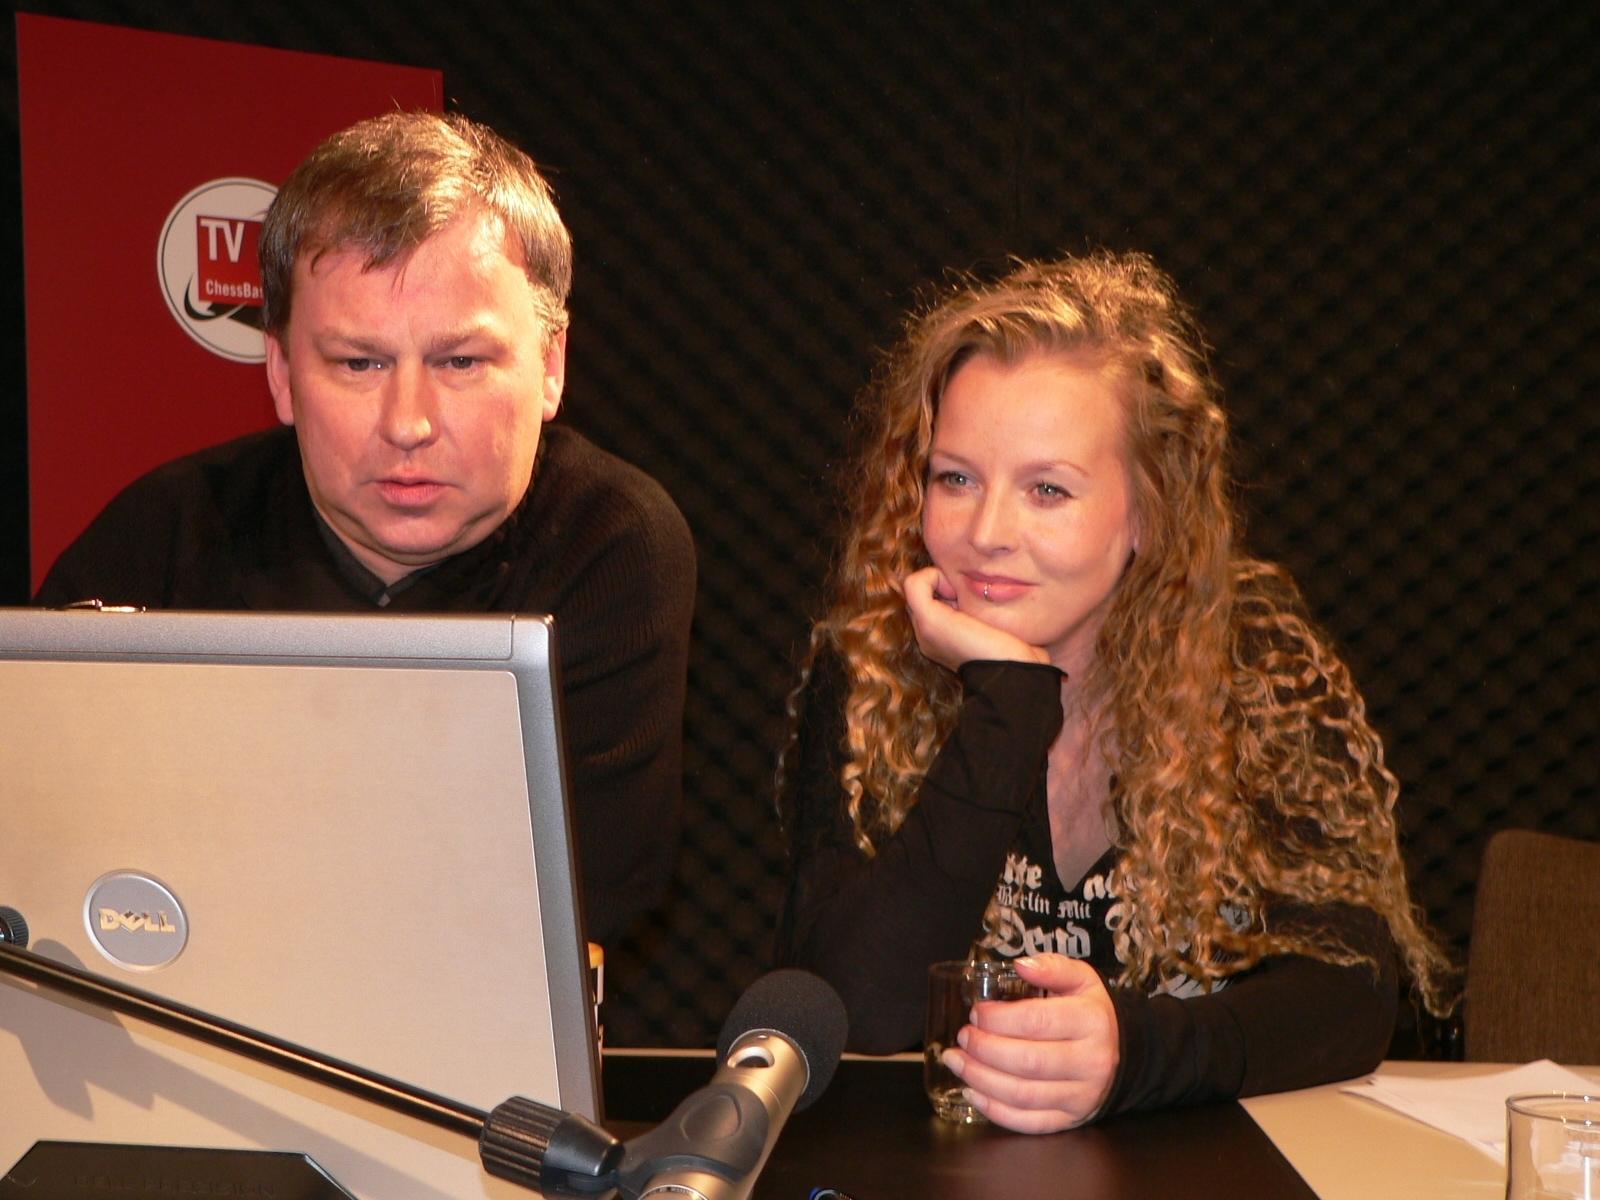 Vaile Fuchs bei TV ChessBase